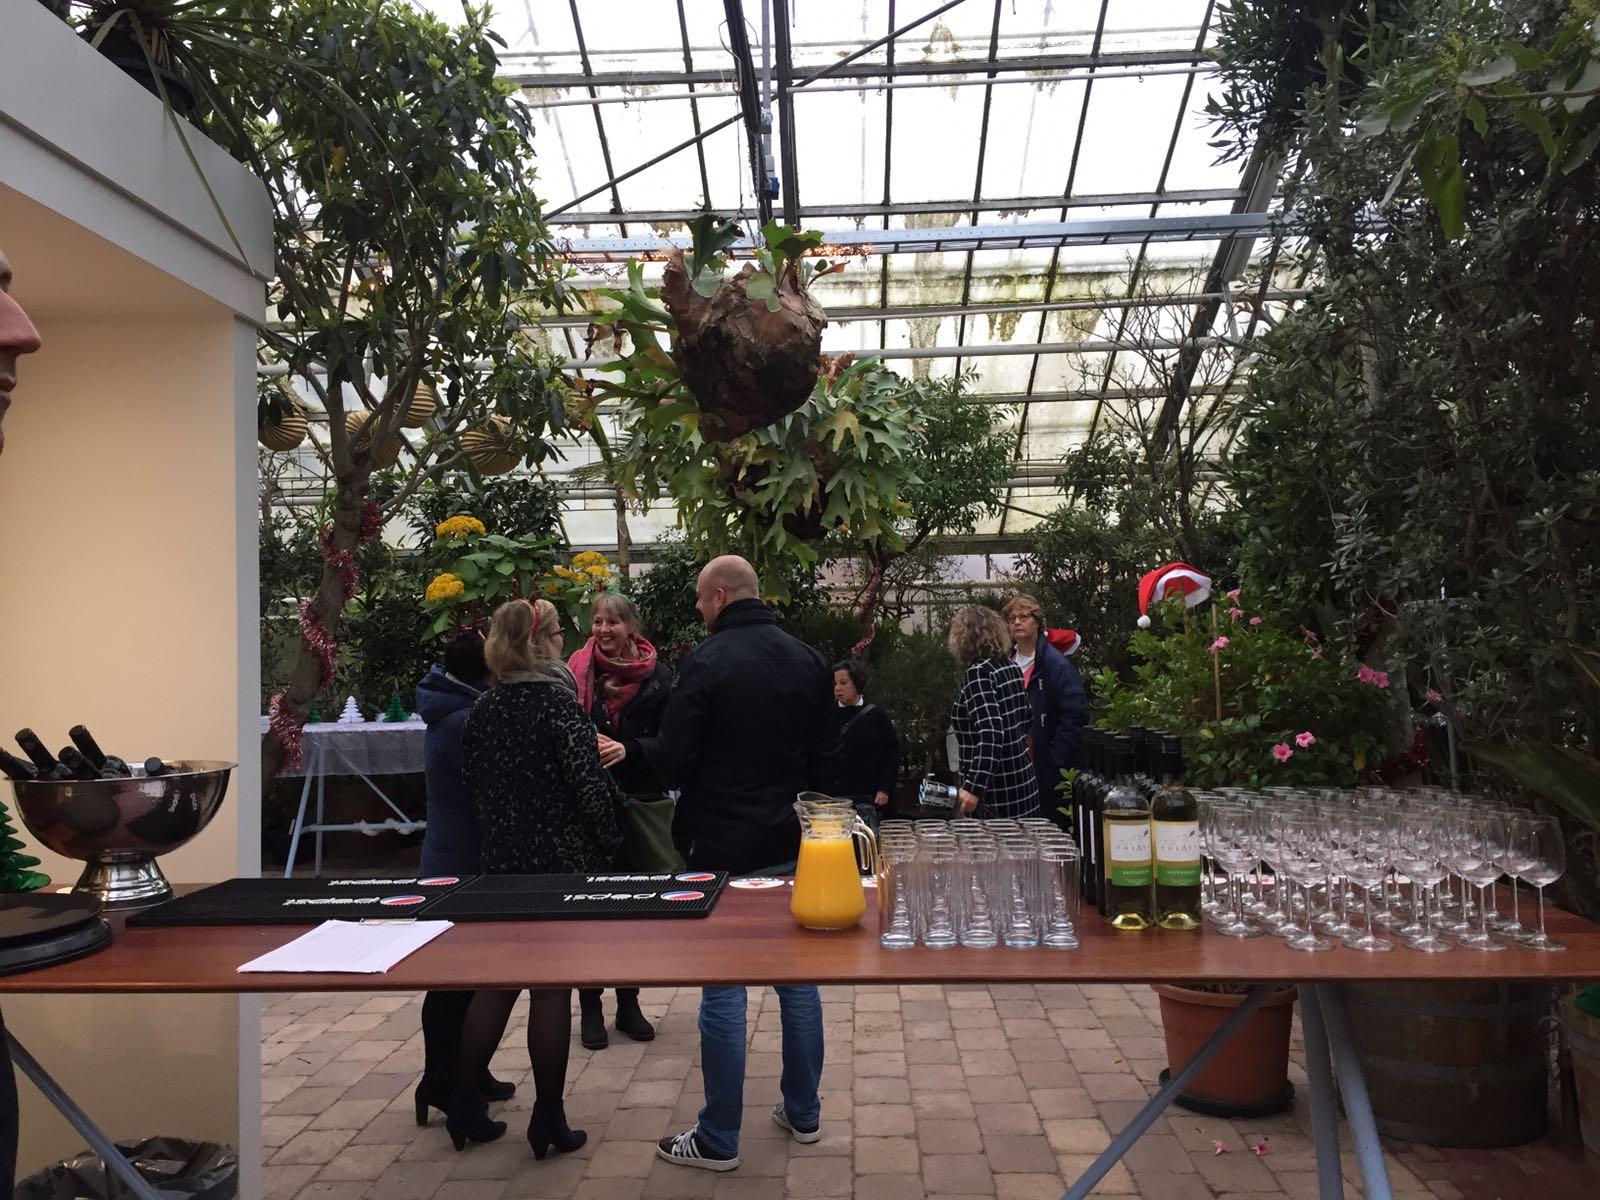 Botanische Tuin Amsterdam : Botanische tuin amsterdam the basket amsterdam